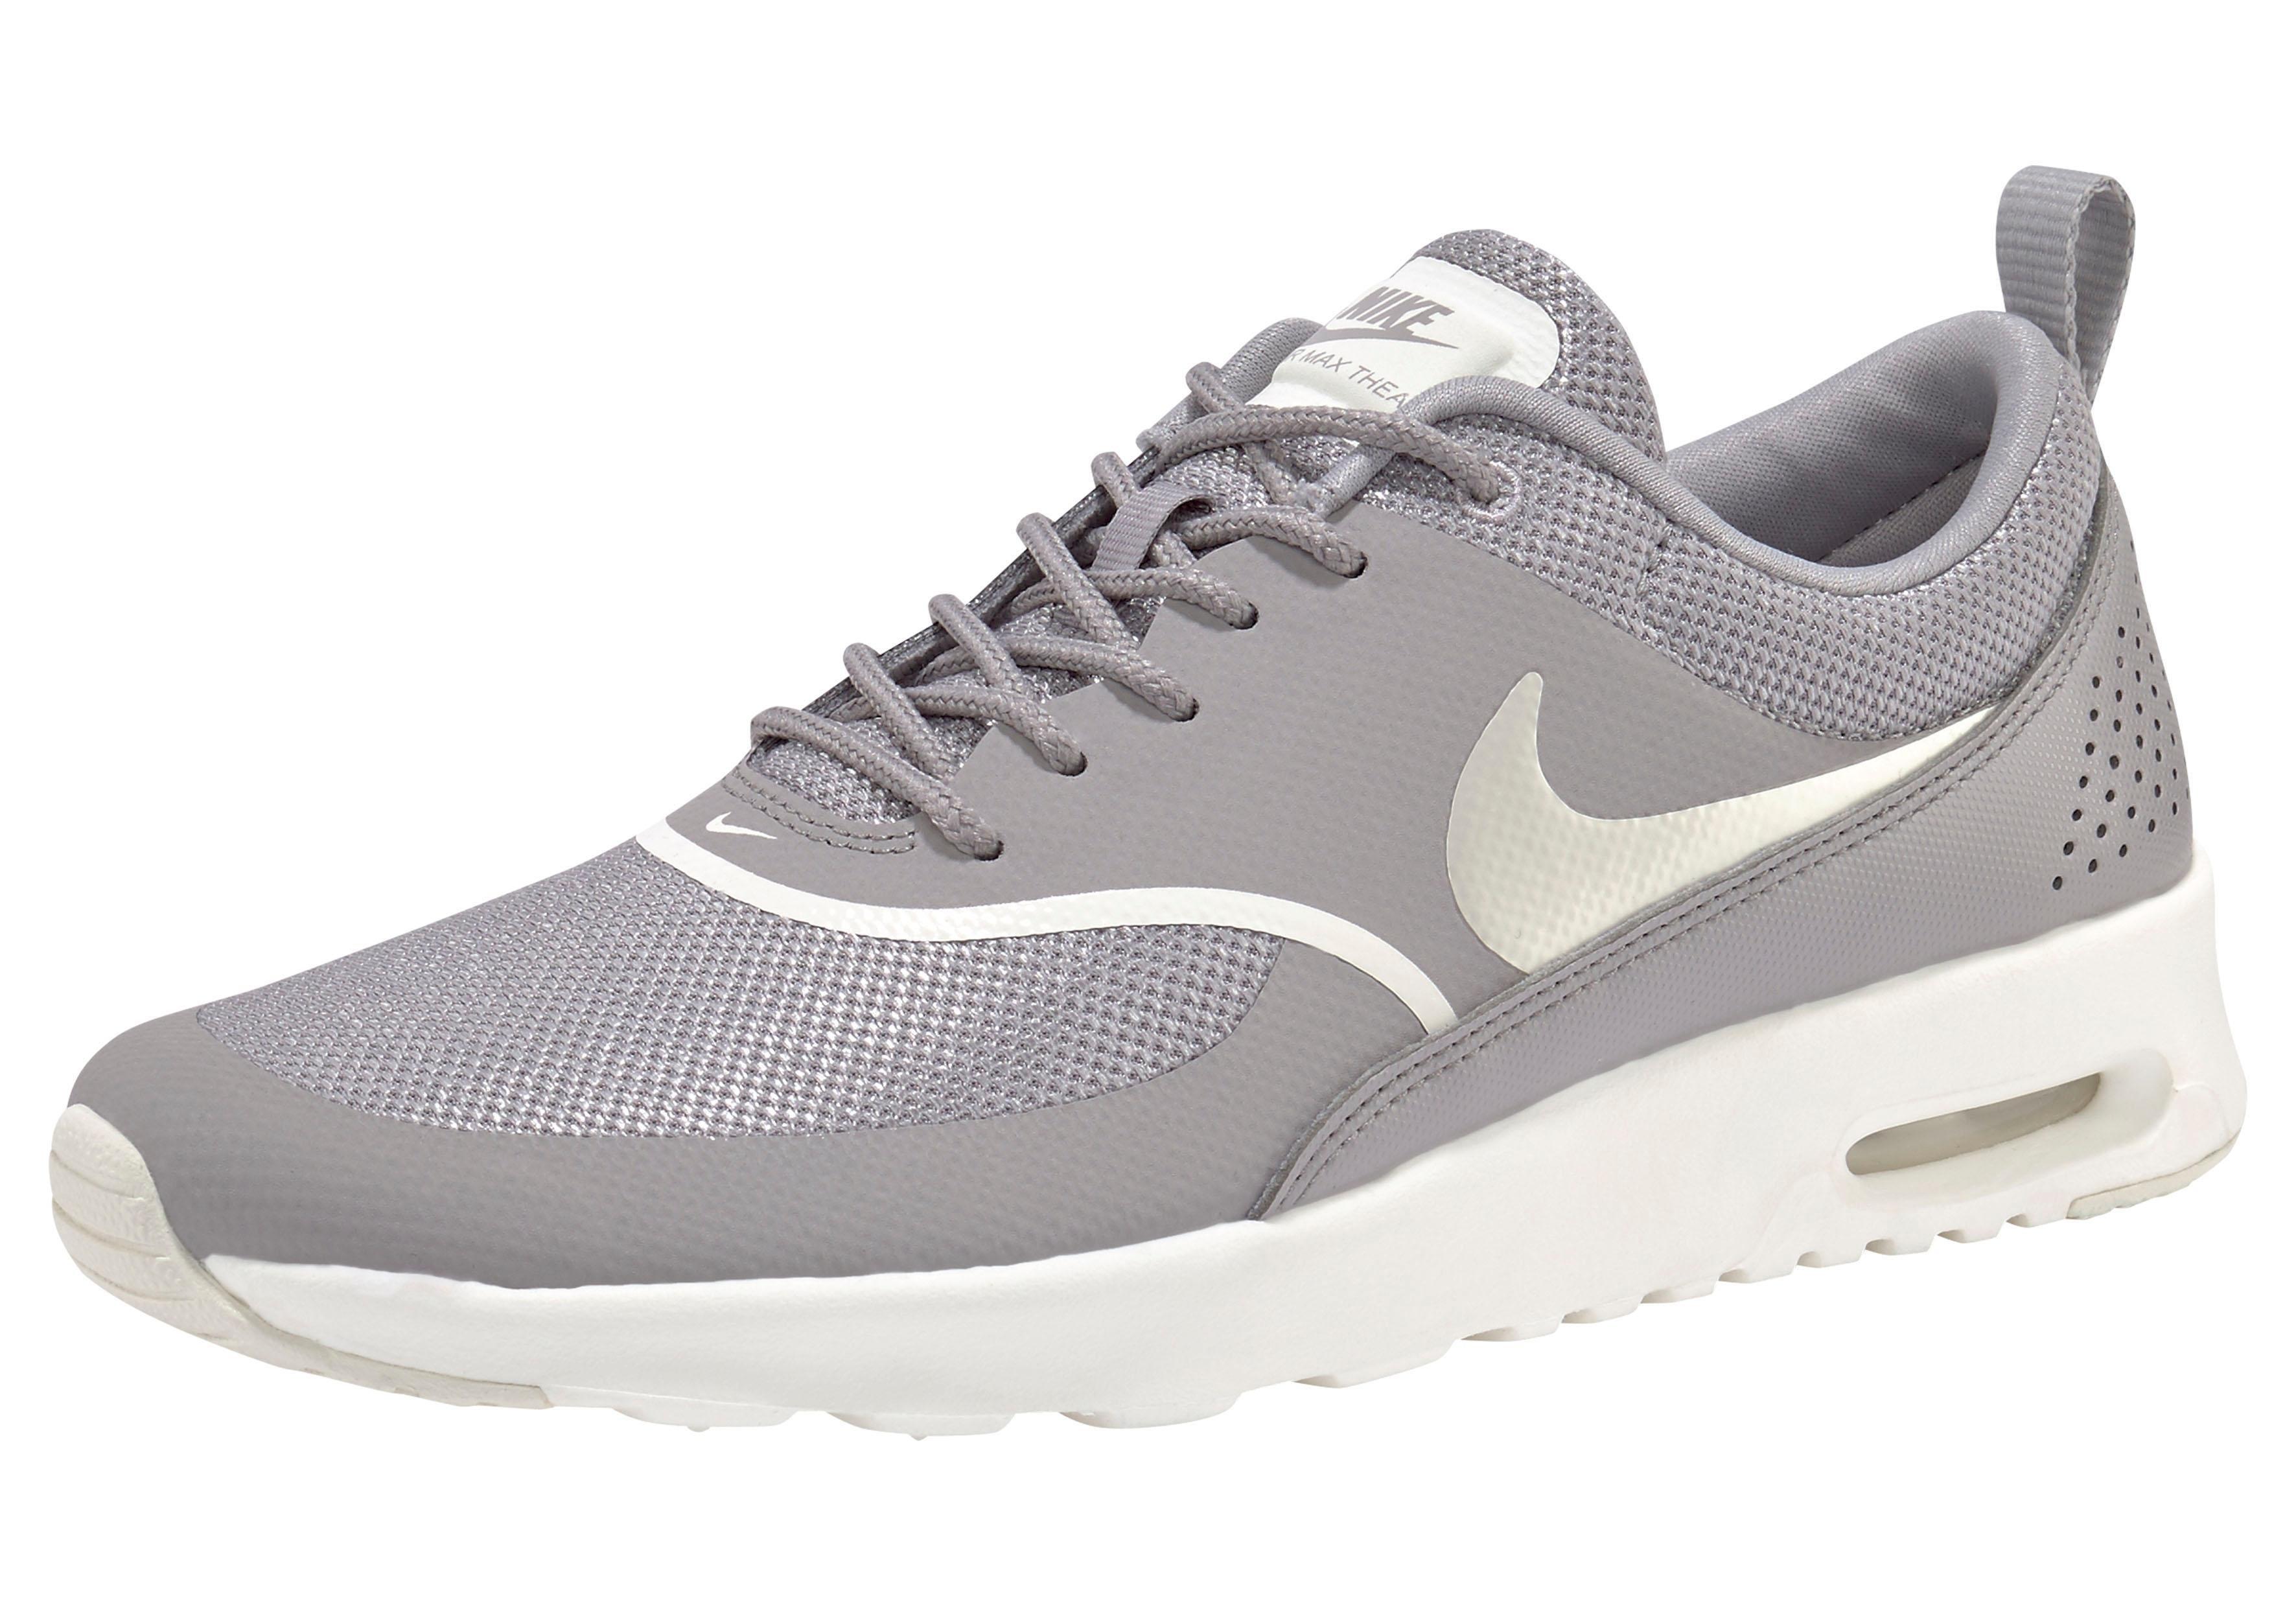 newest 857ac 6a382 ... Nike Sportswear sneakers »Air Max Thea«, Nike Sportswear sneakers »Air  Max Thea«, Nike Sportswear sneakers »Air Max Thea«